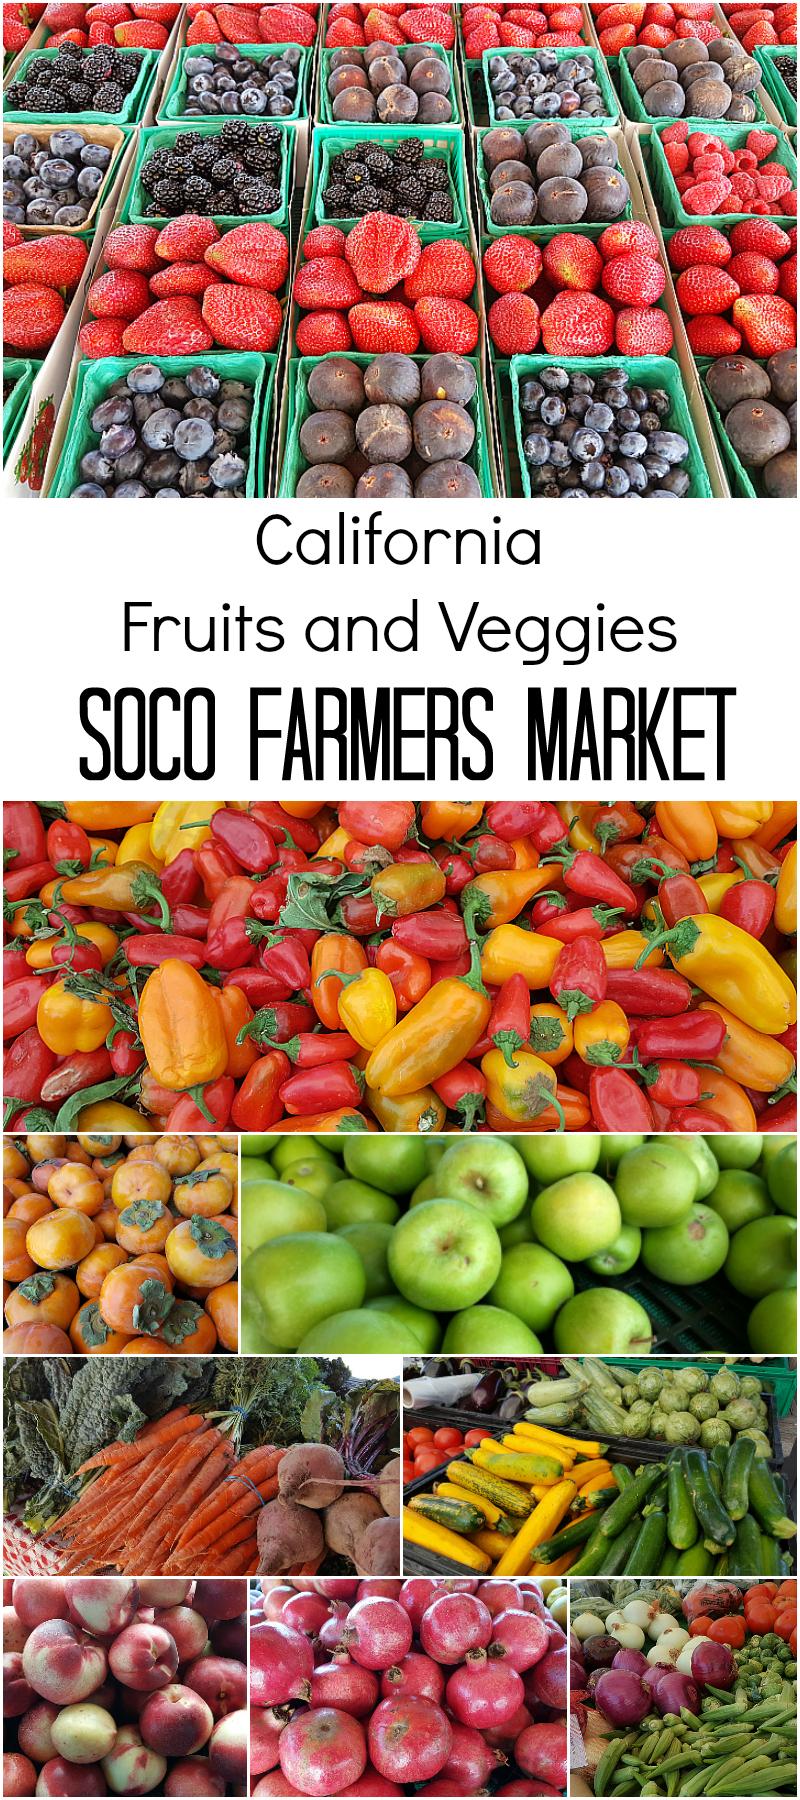 California Fruits and Veggies at the SoCo Farmer's Market - Costa Mesa, California